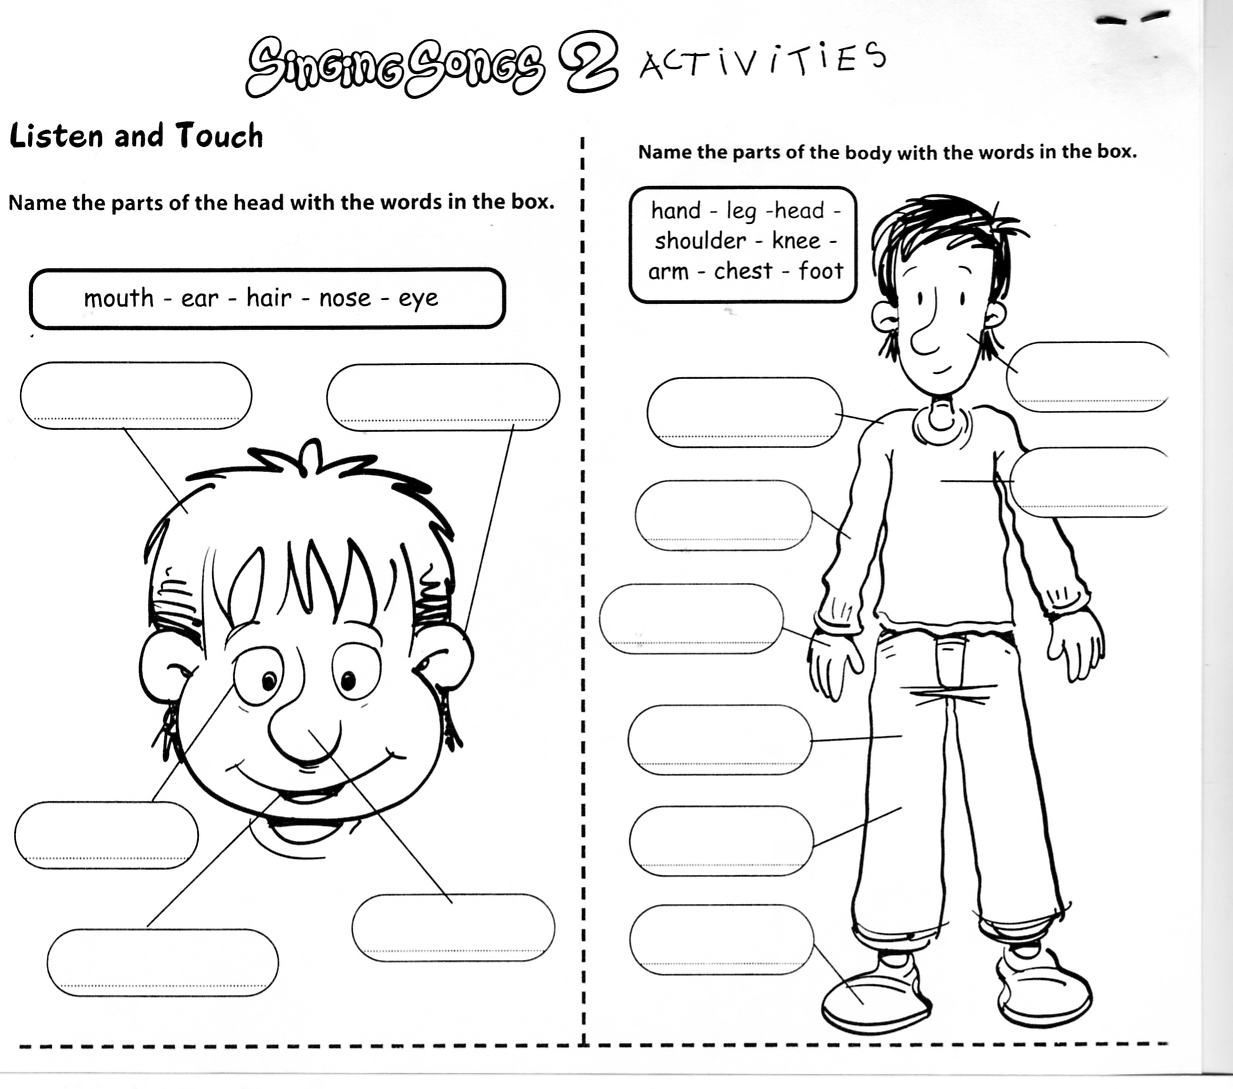 learningenglish-esl: BODY WORKSHEETS   Alphabet worksheets preschool [ 1089 x 1233 Pixel ]